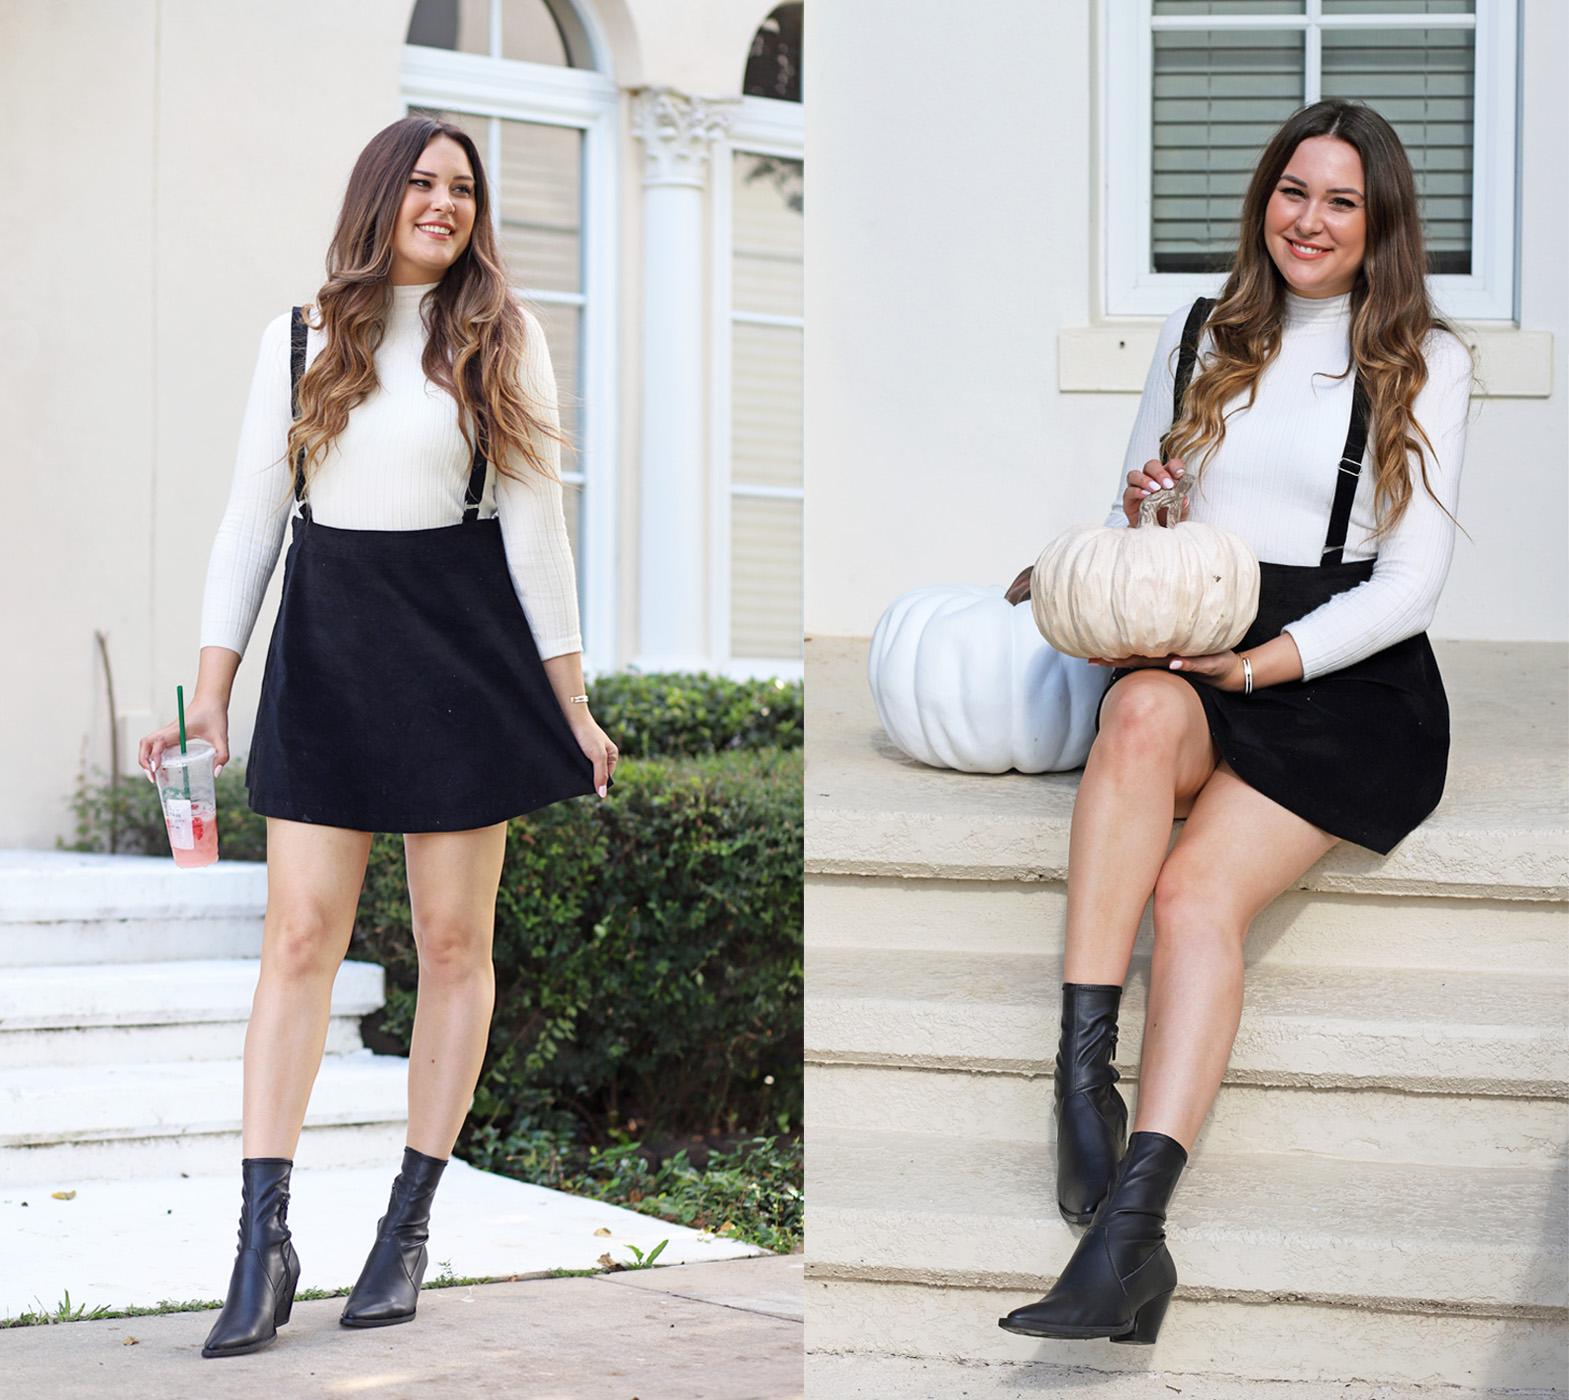 Mash Elle beauty blogger dating advice Mr. Right